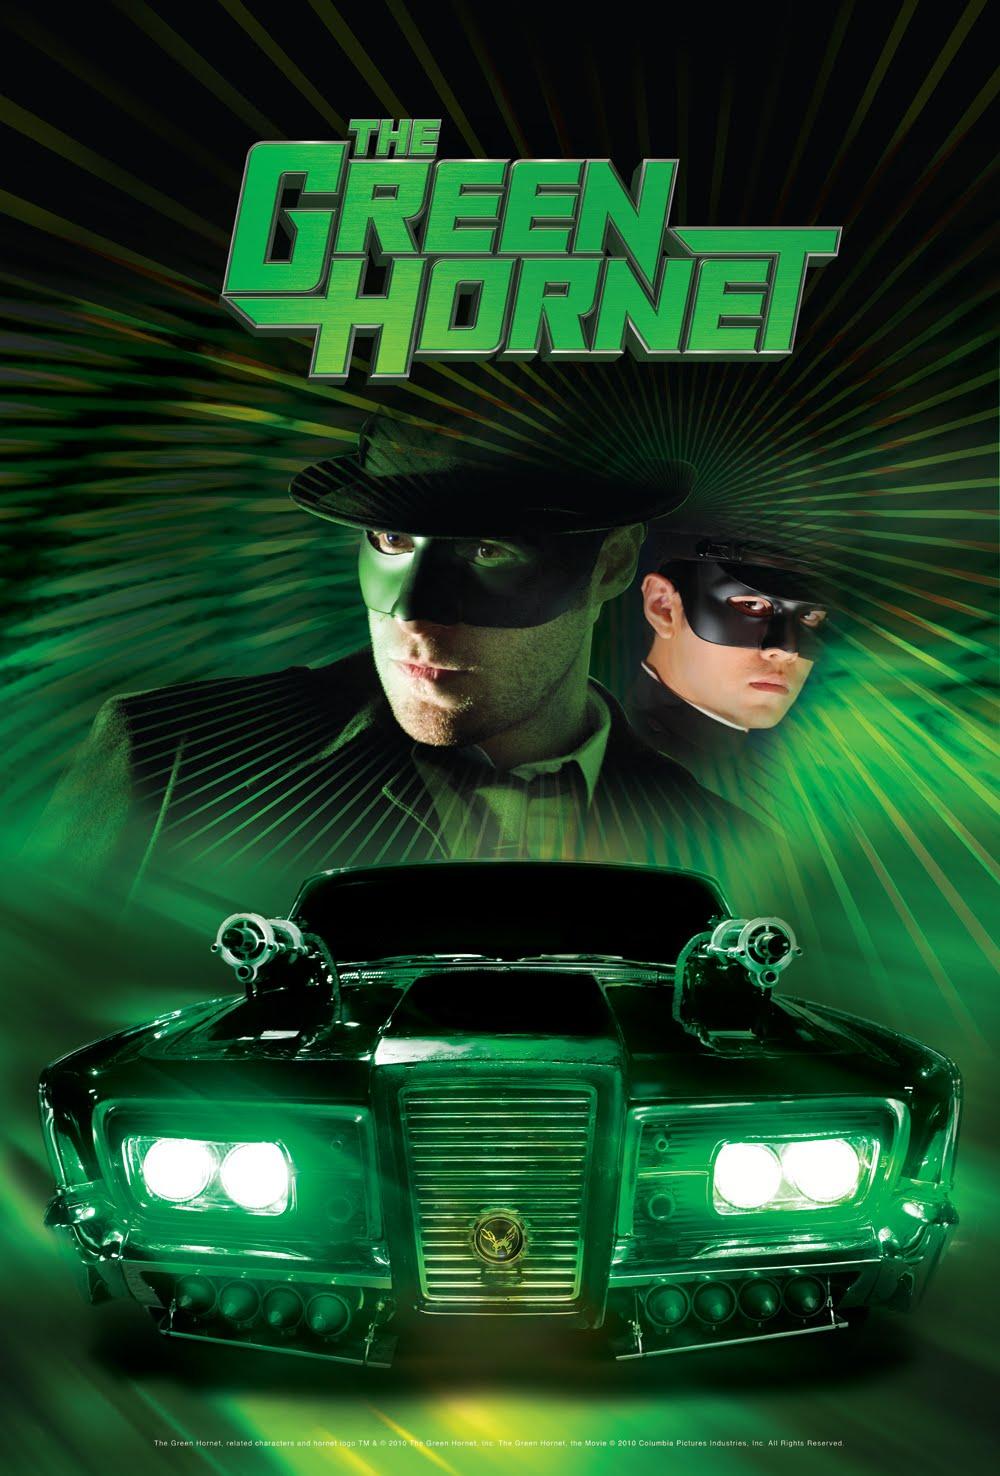 Category:Movies | Green Hornet Wiki | FANDOM powered by Wikia